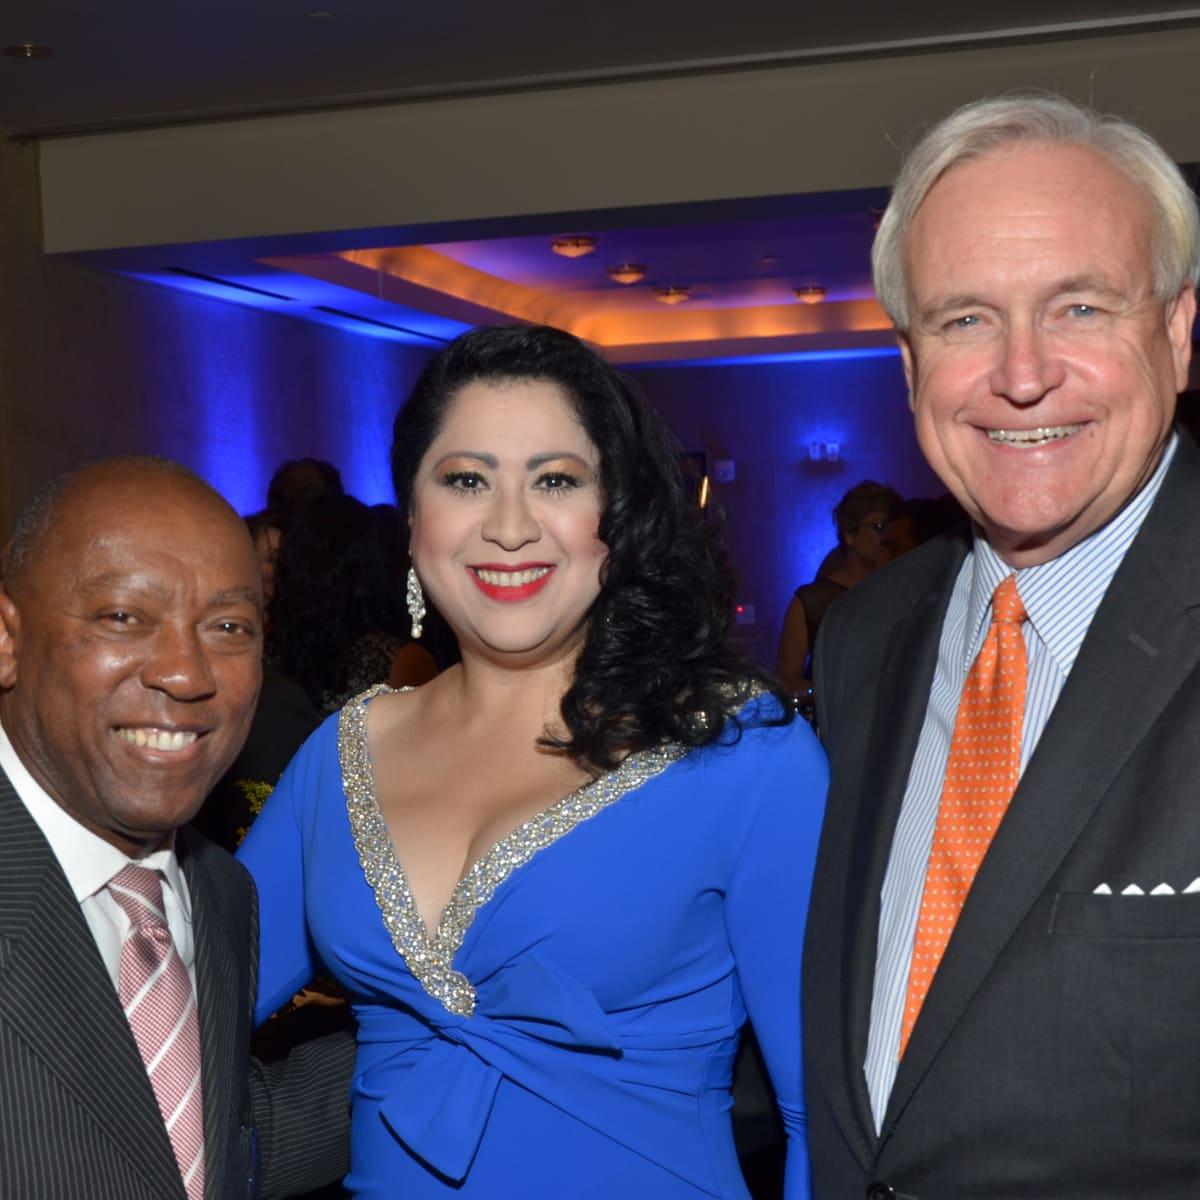 News, Shelby, Hispanic Chamber gala, Nov. 2015, Sylvester Turner, Laura Murillo, Bill King